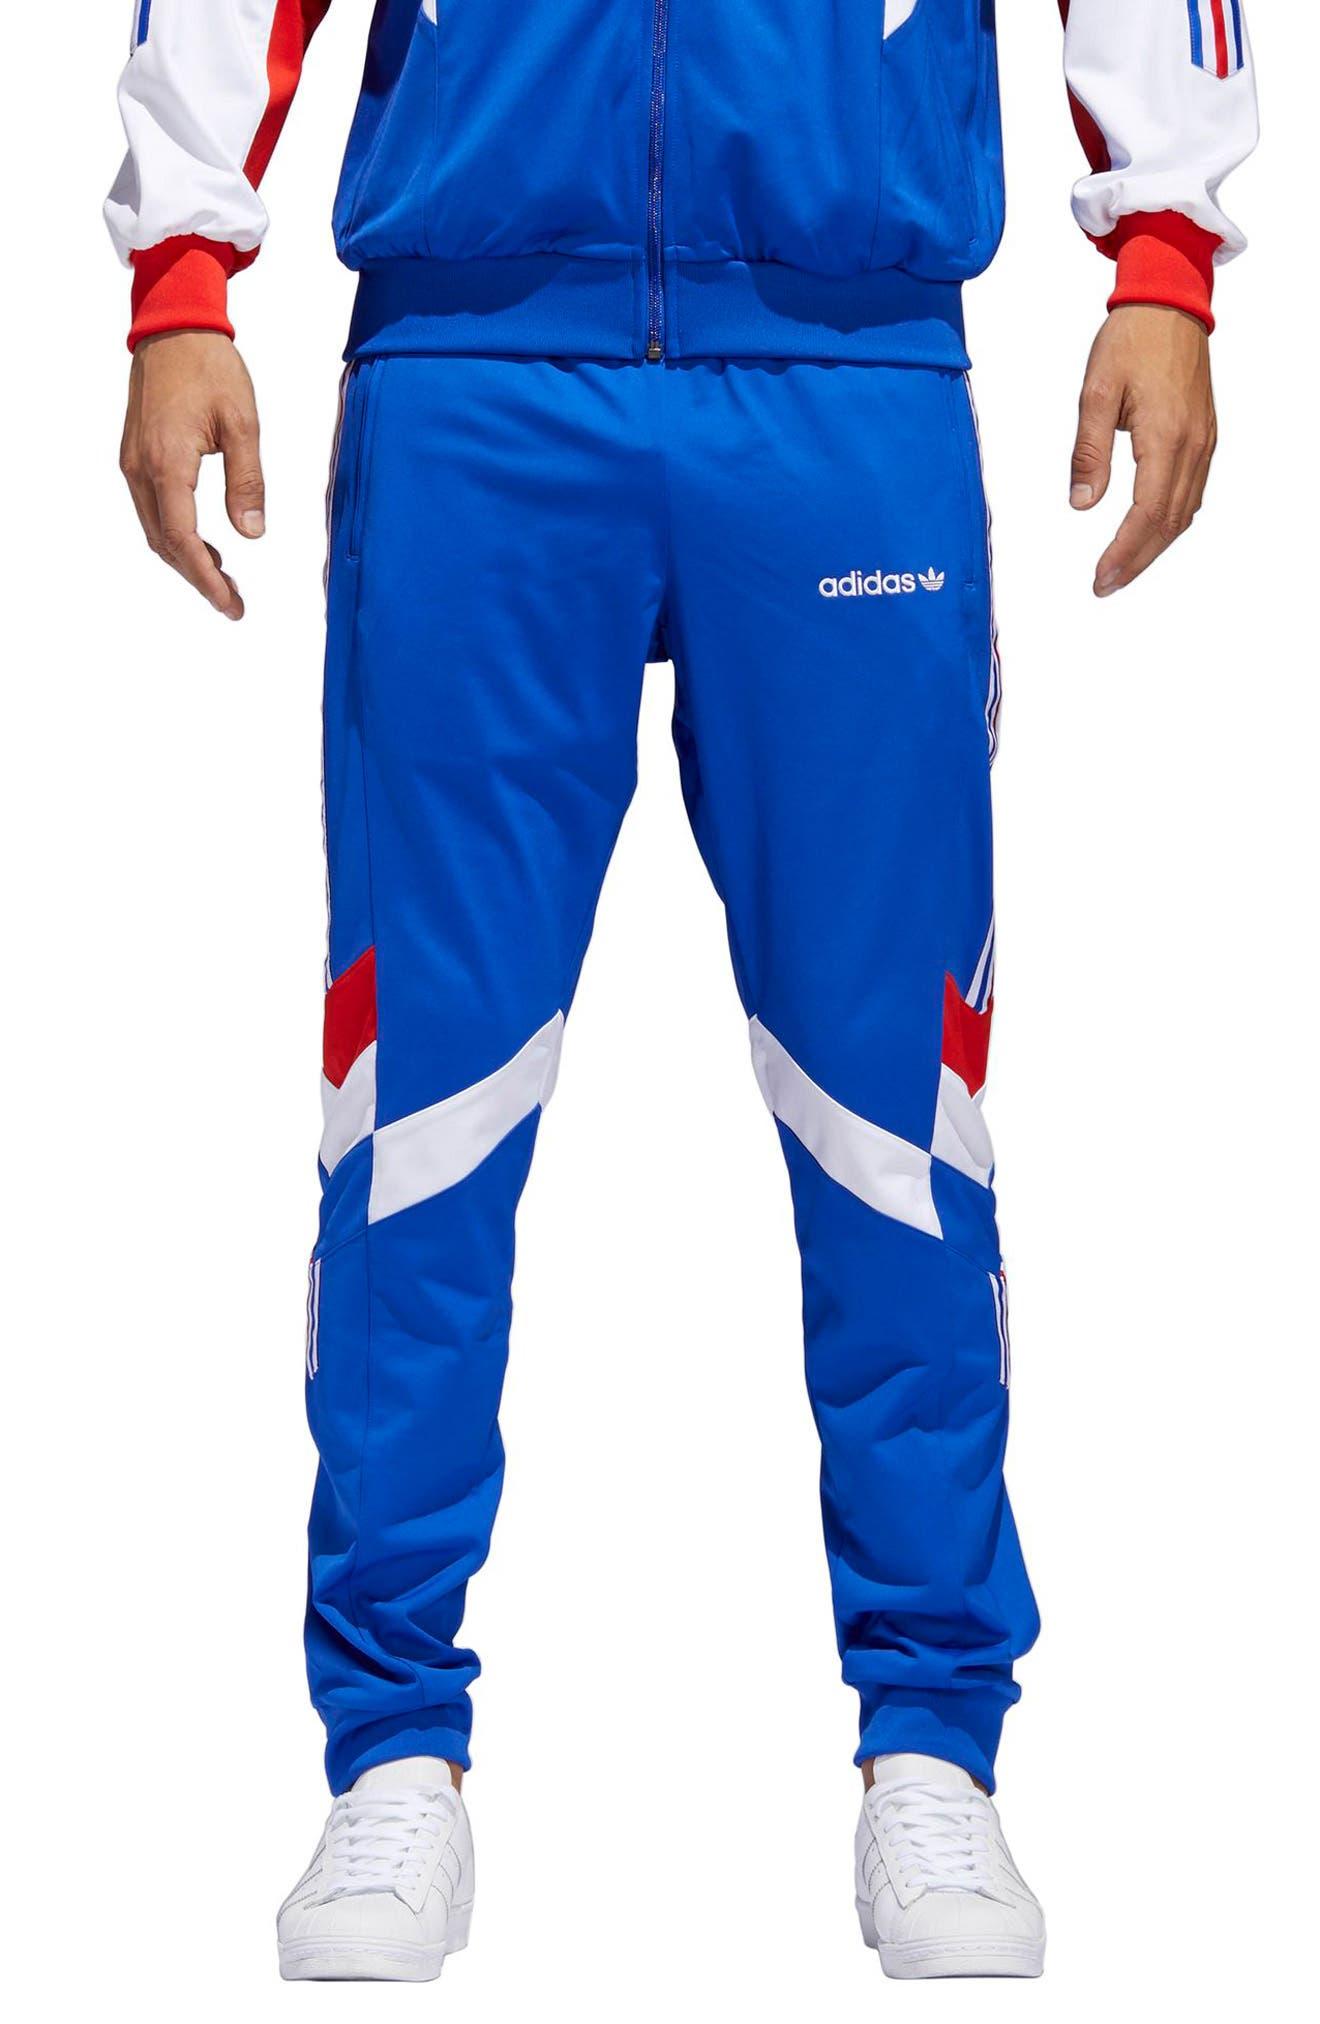 Aloxe Slim Track Pants,                             Main thumbnail 1, color,                             Bold Blue/ White